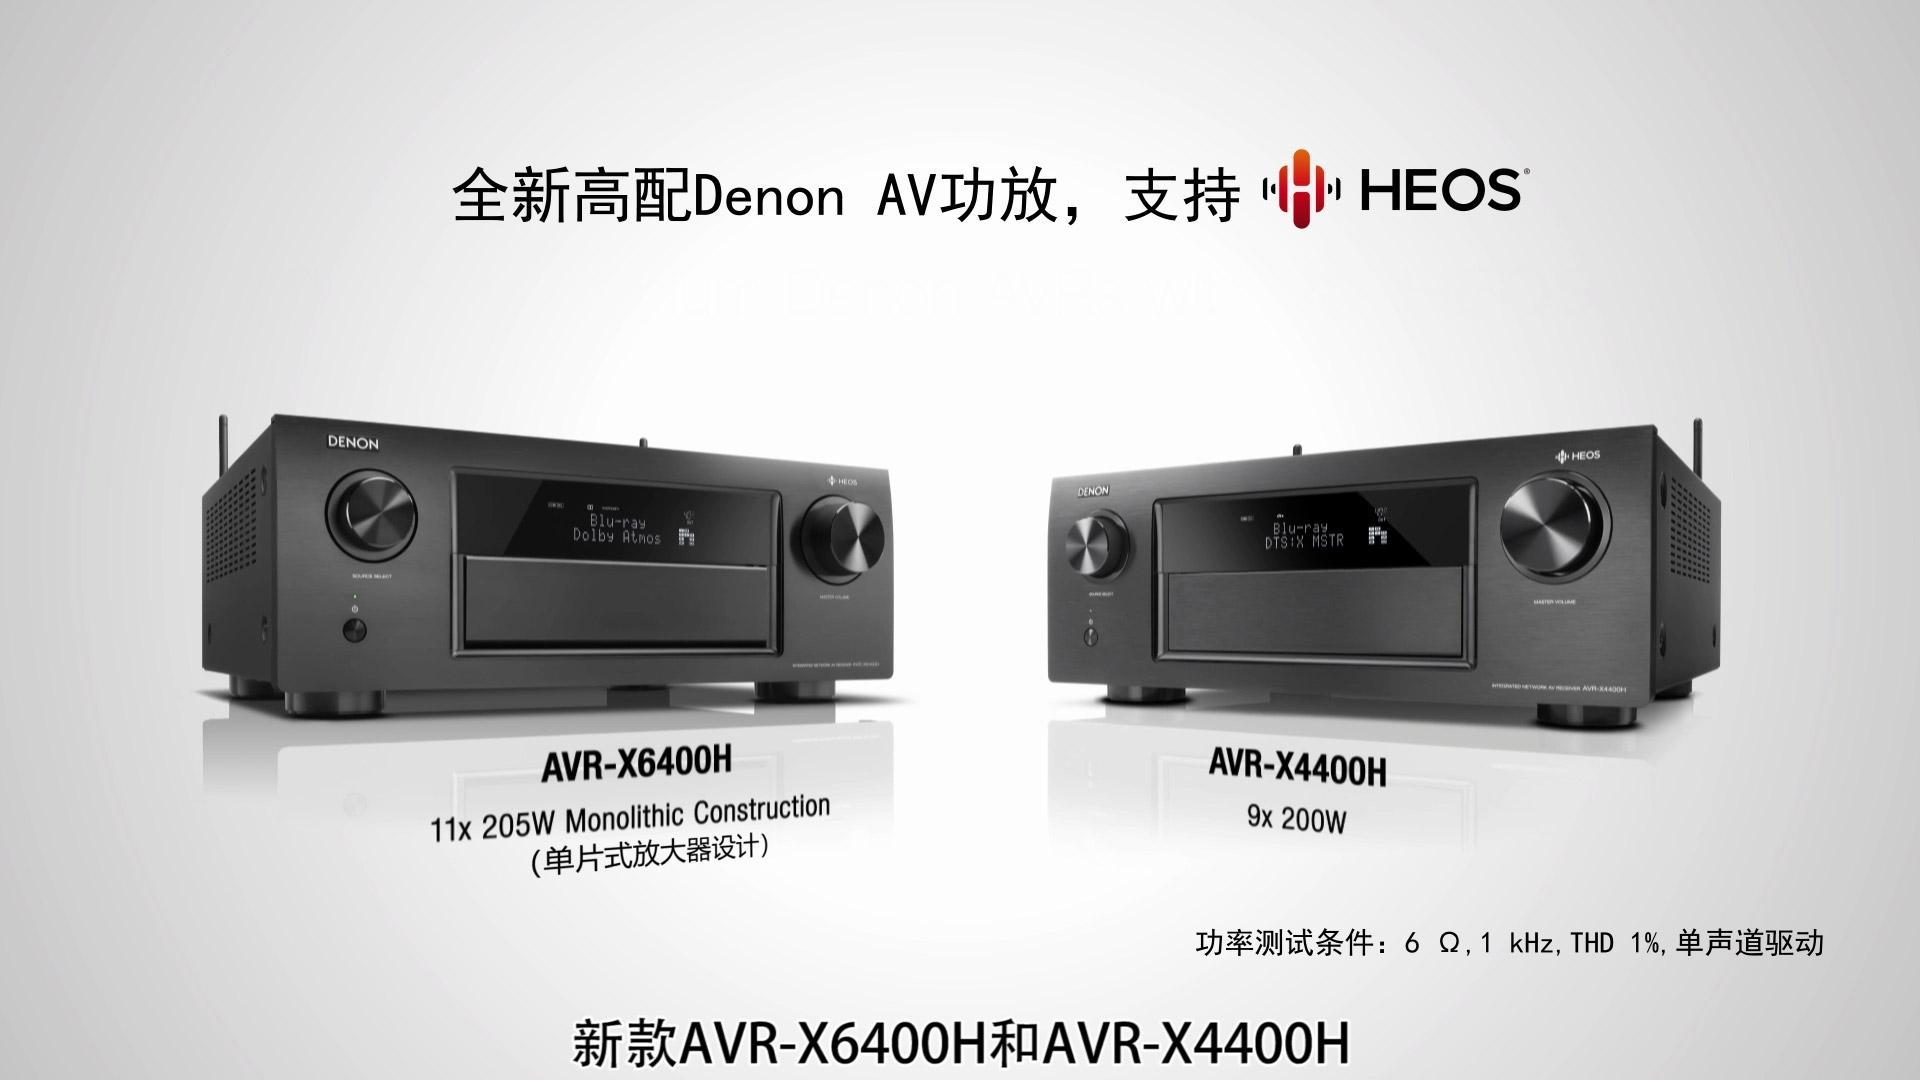 CN_denon_avr_x6400h_x4400h_改字幕_FINAL_0313_2